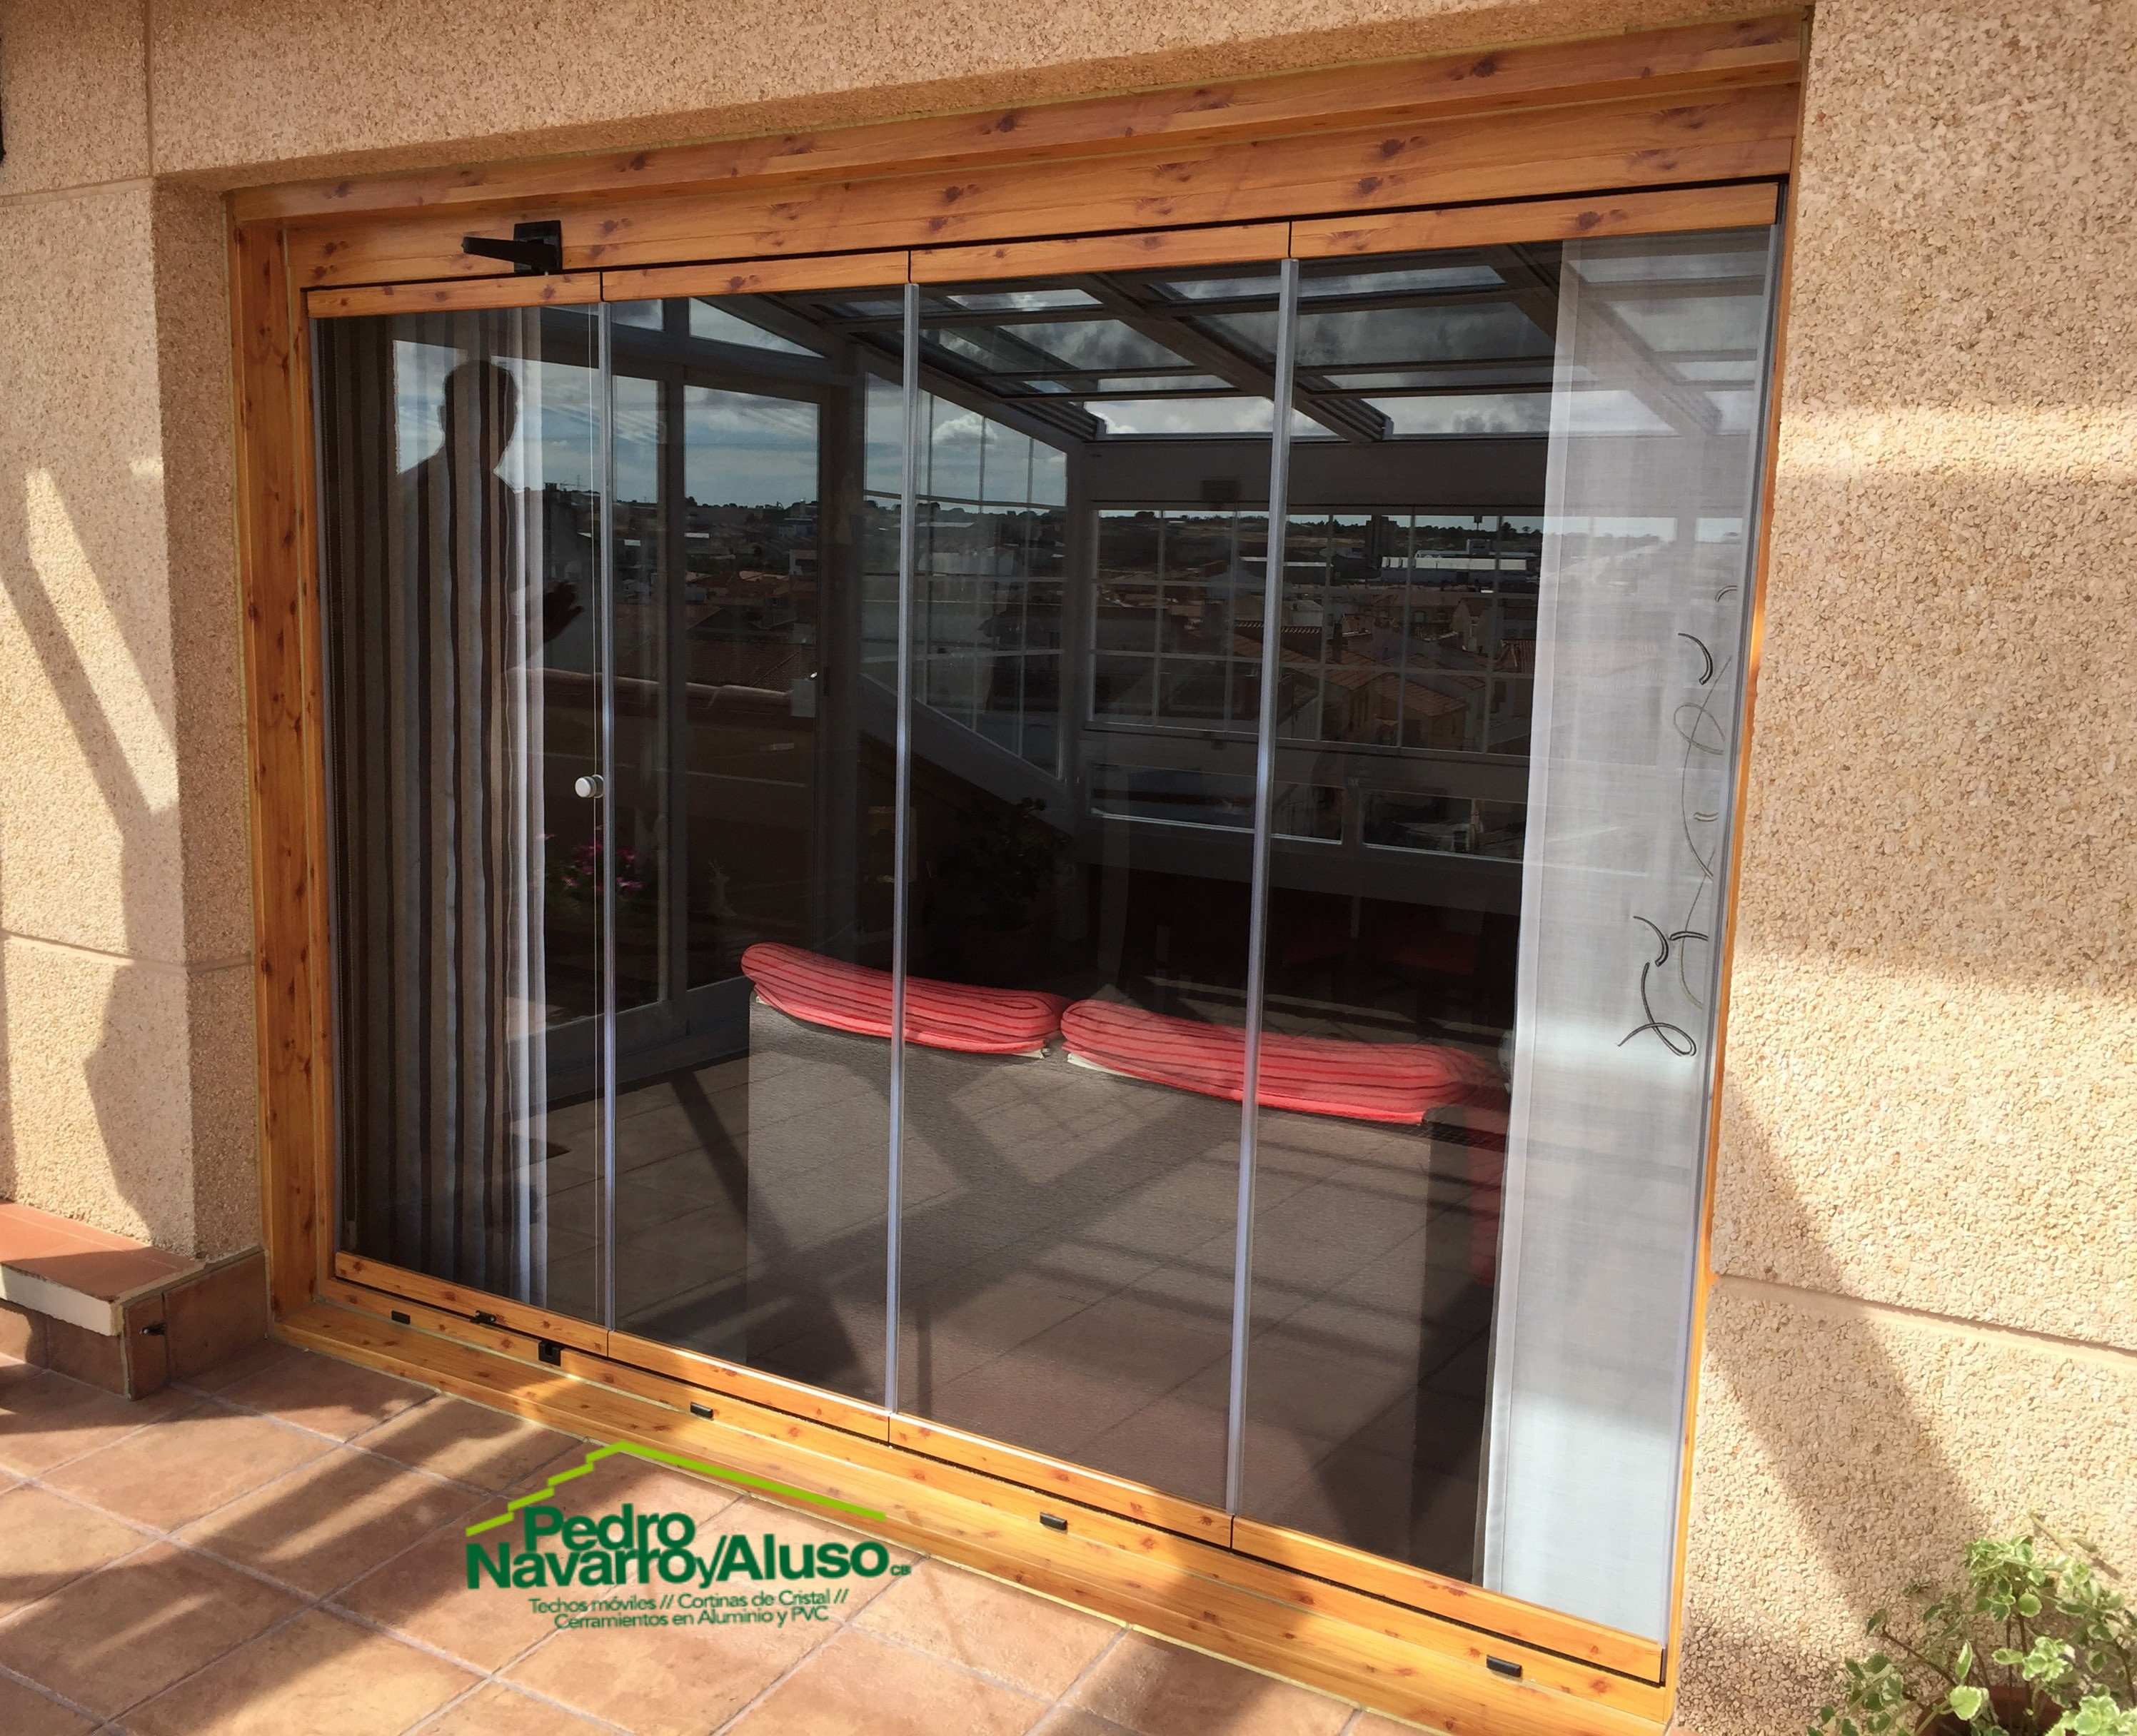 techo-movil-ventana-cortinas-cristal-madrid